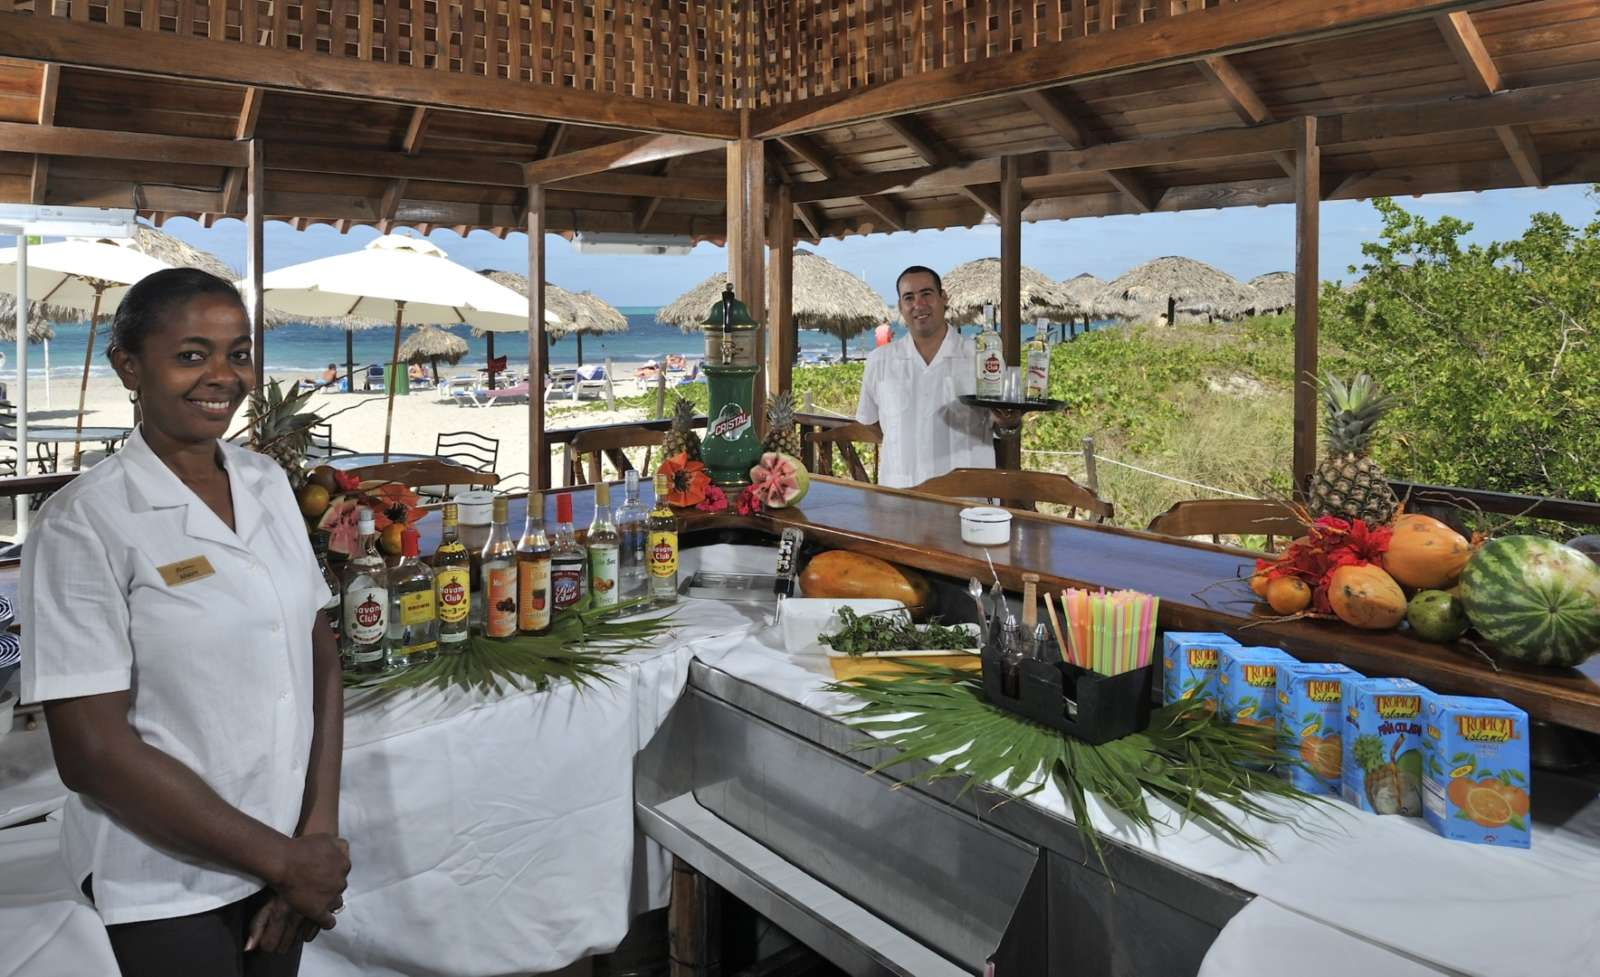 Beach bar staff at Paradisus Princesa Varadero